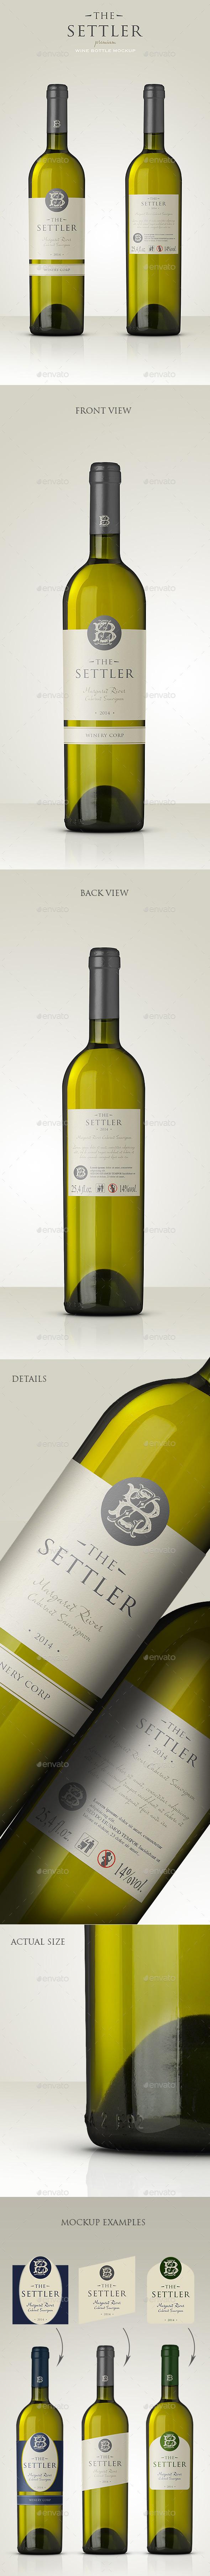 Premium White Wine Mockup - Food and Drink Packaging